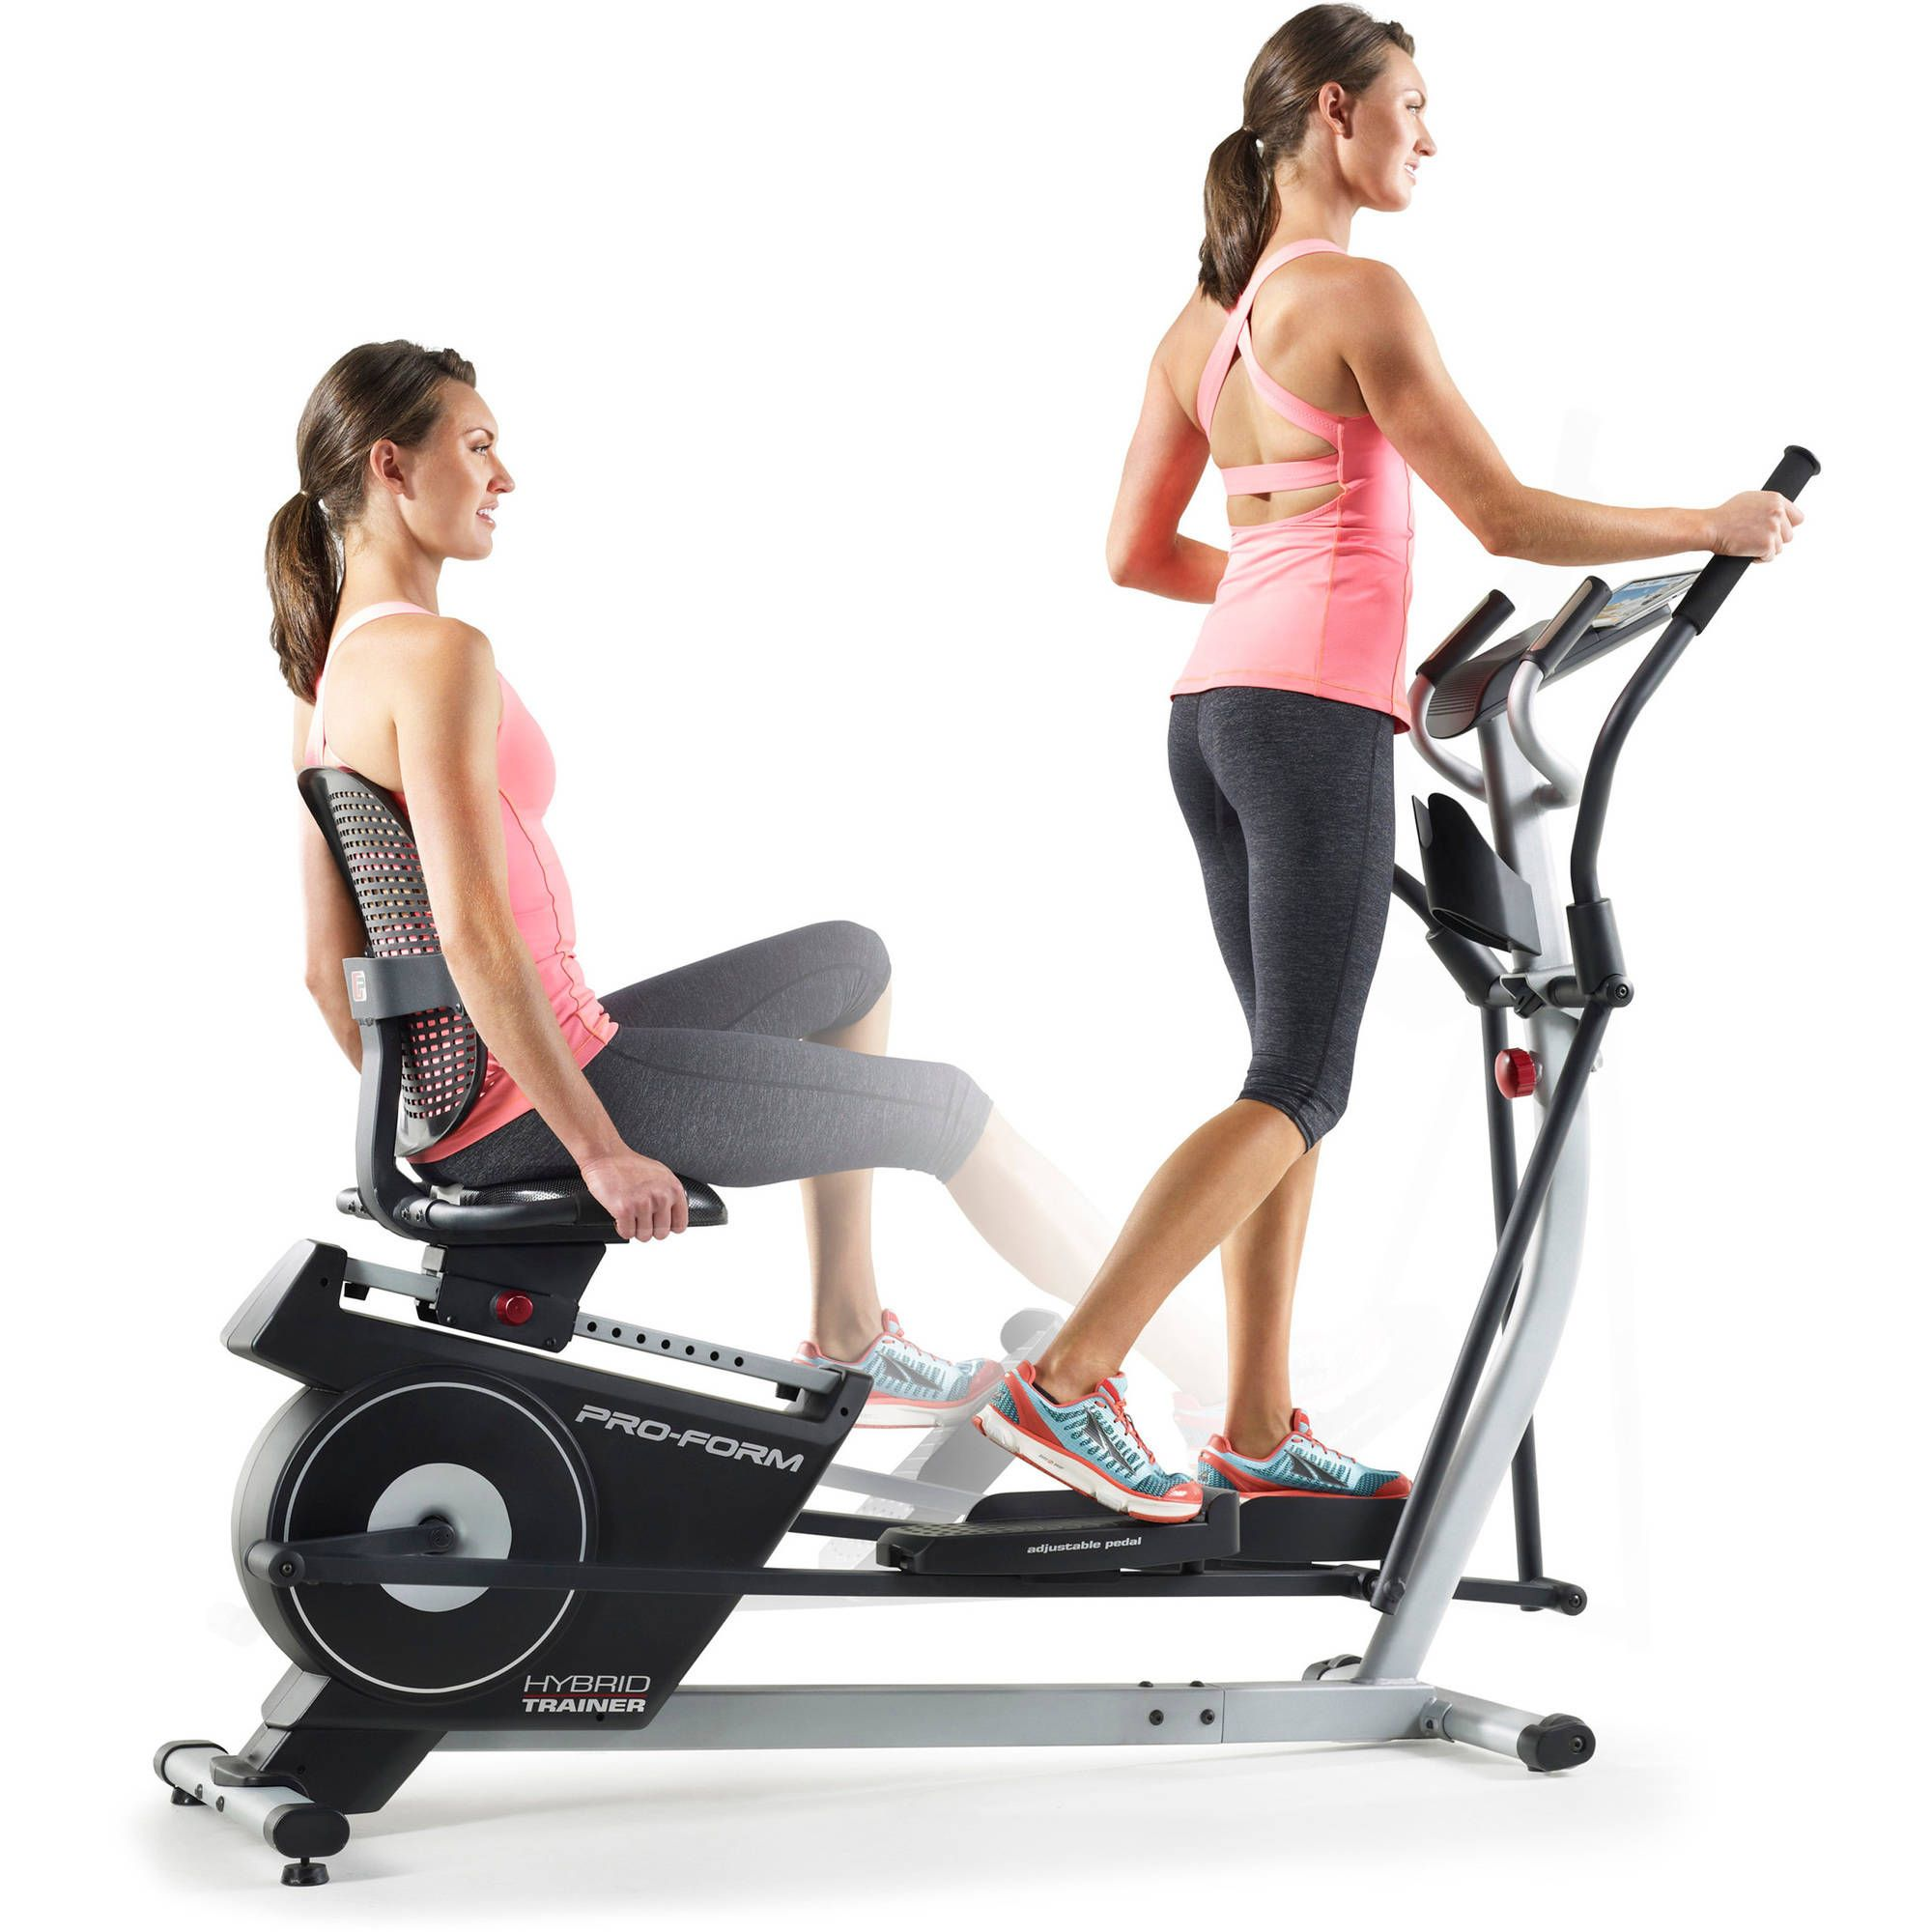 Proform Hybrid Trainer 2 In 1 Elliptical And Recumbent Bike Price